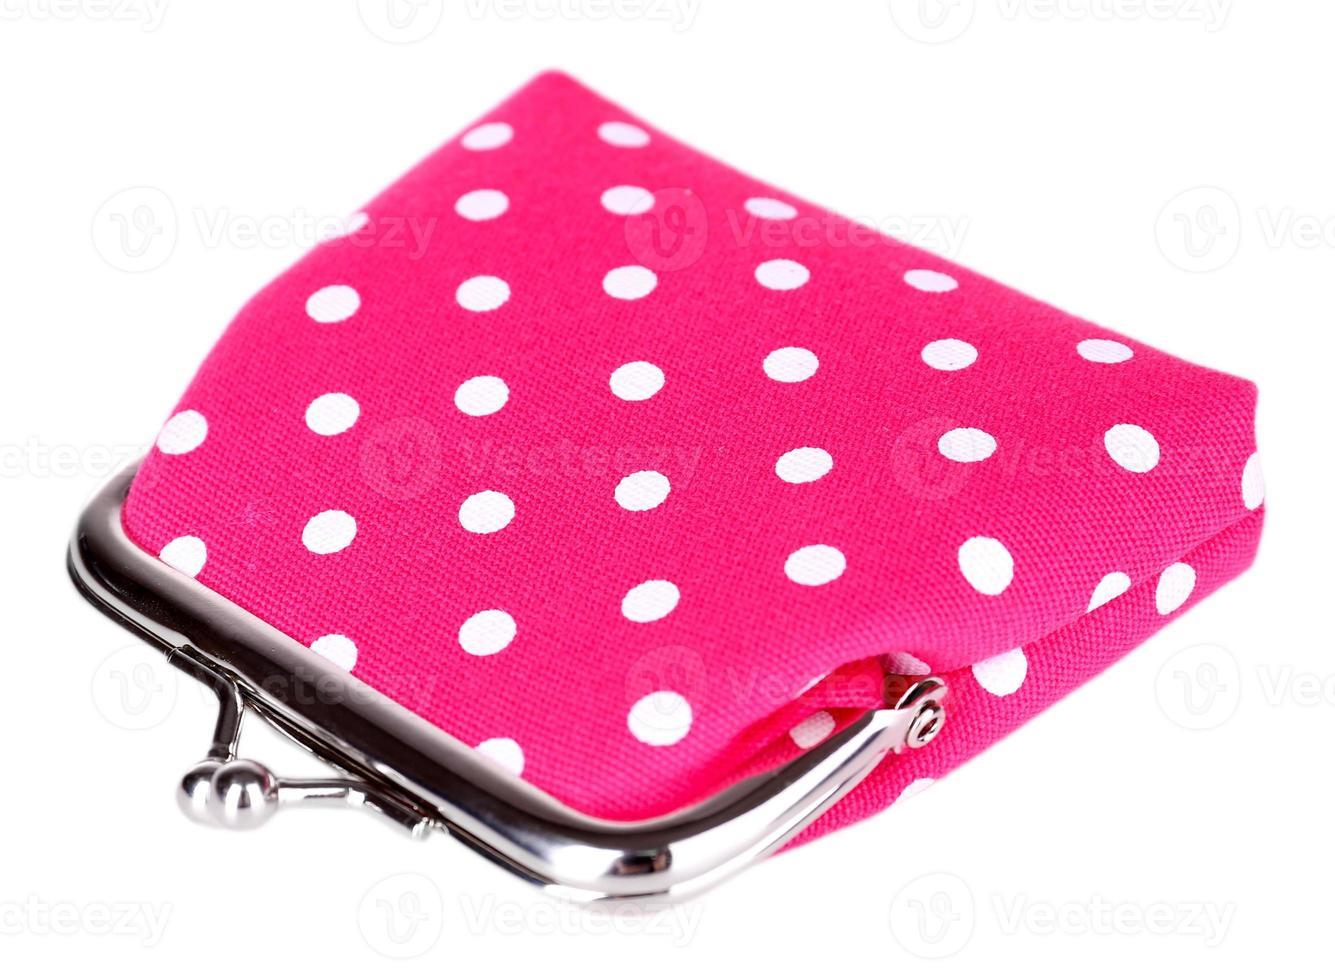 bolsa rosa isolada no branco foto